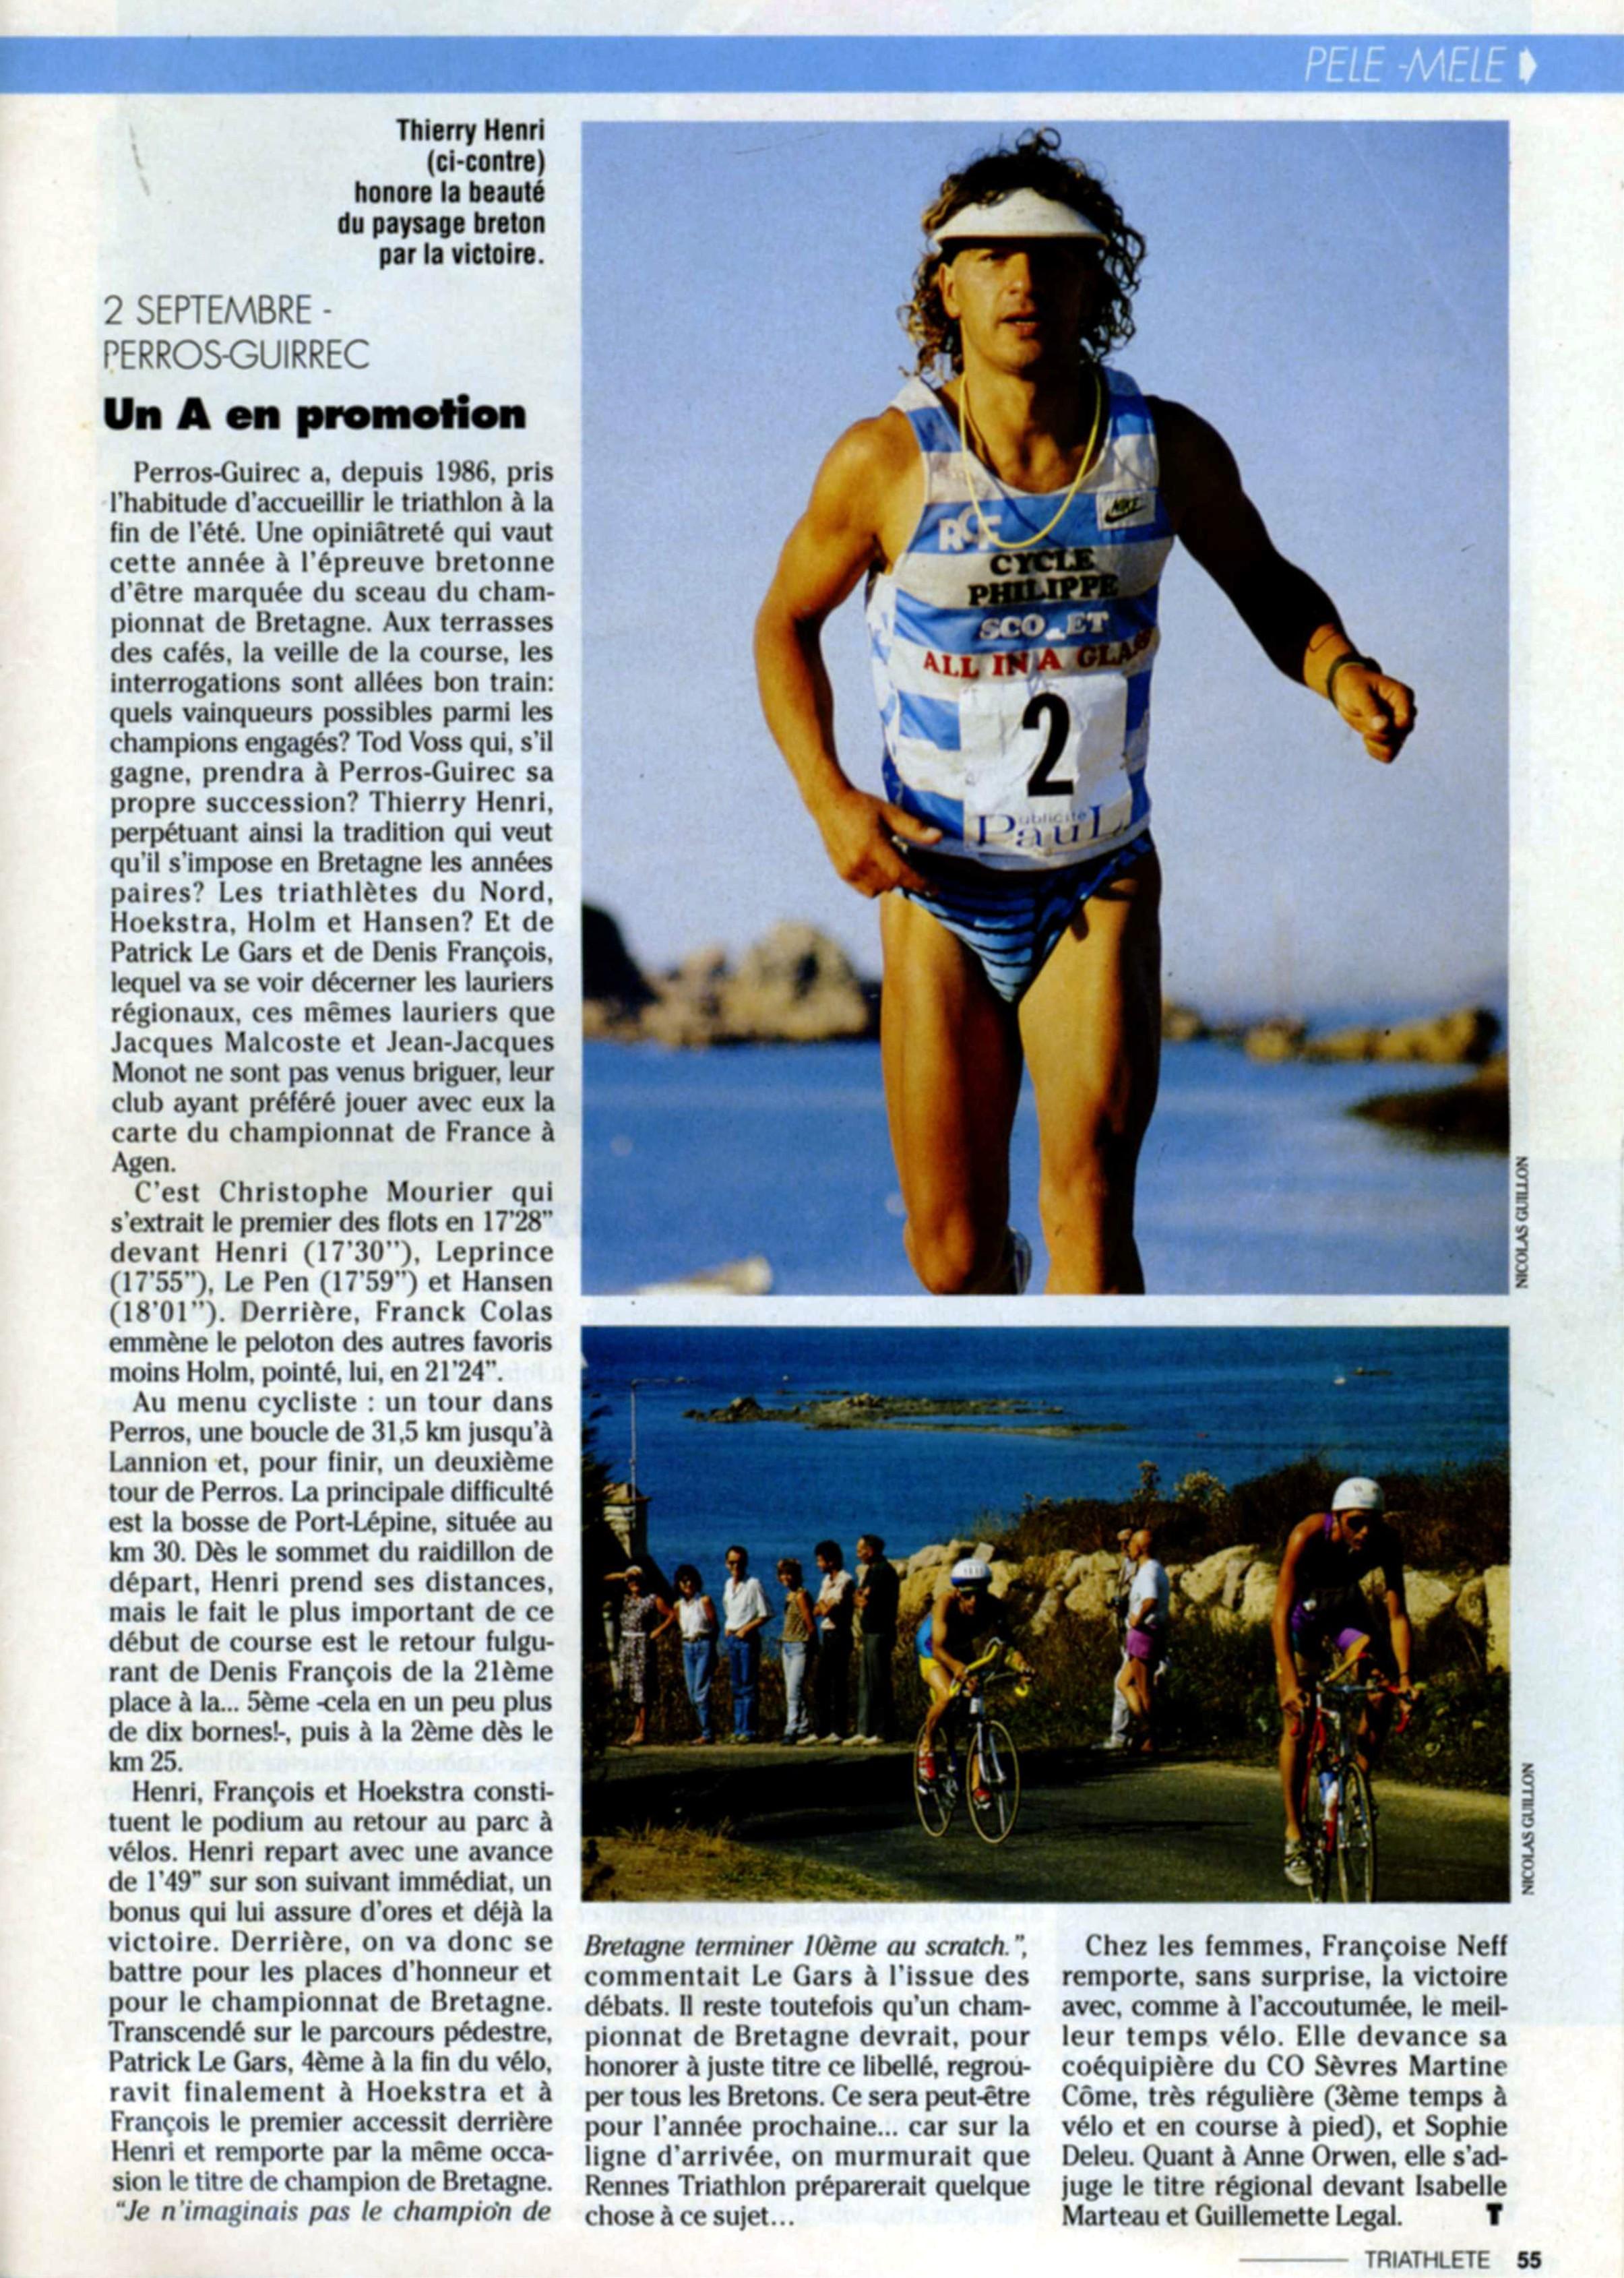 img973_02-09-1988_PERROS-GUIREC